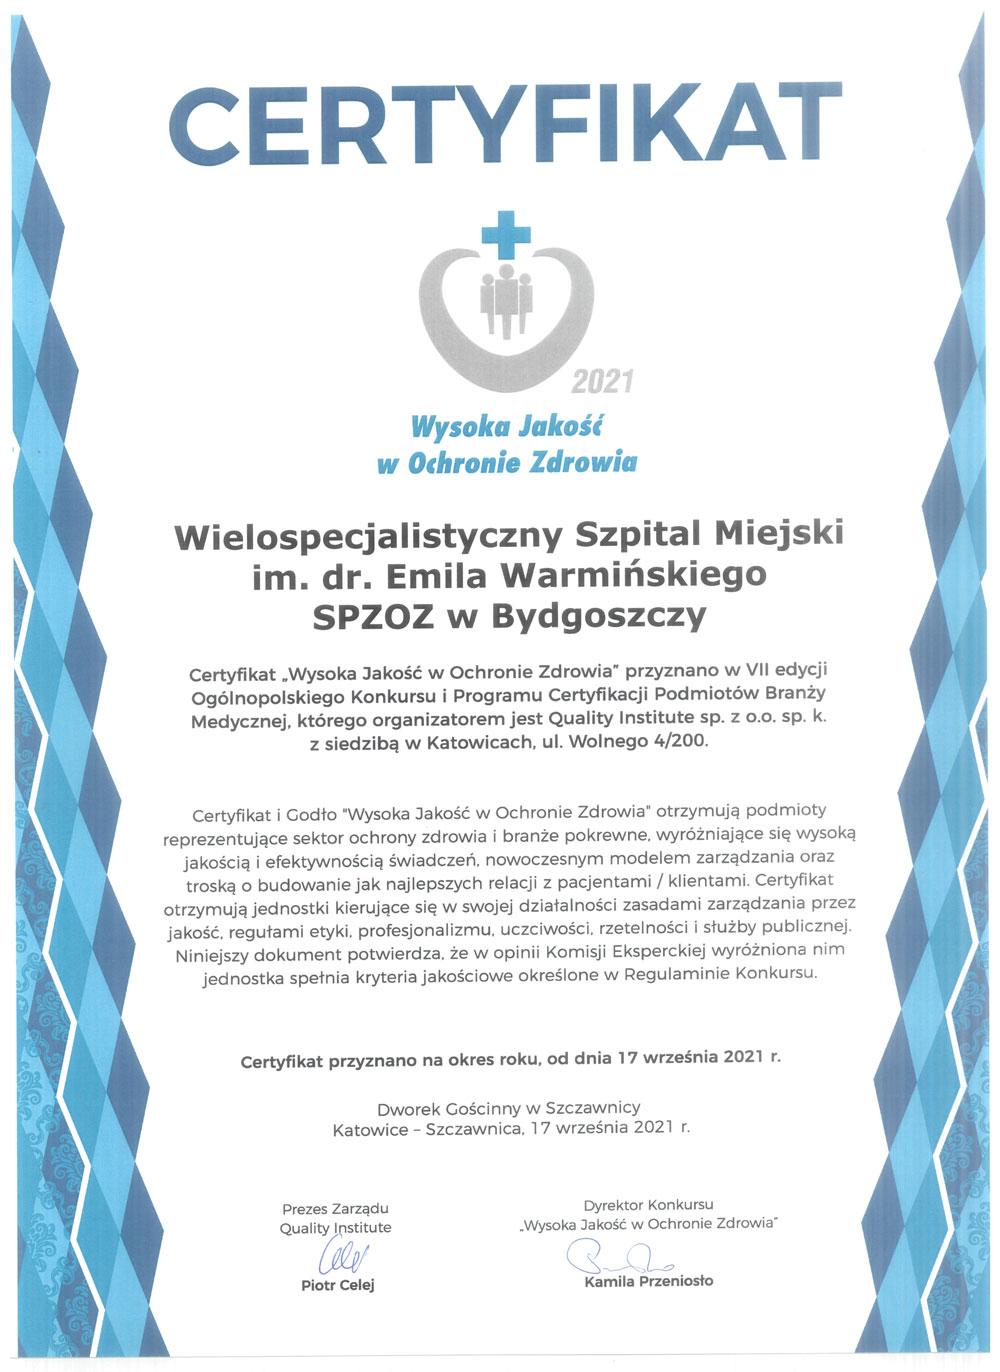 000_certyfikat_wjwoz_wsm_bdg.jpg